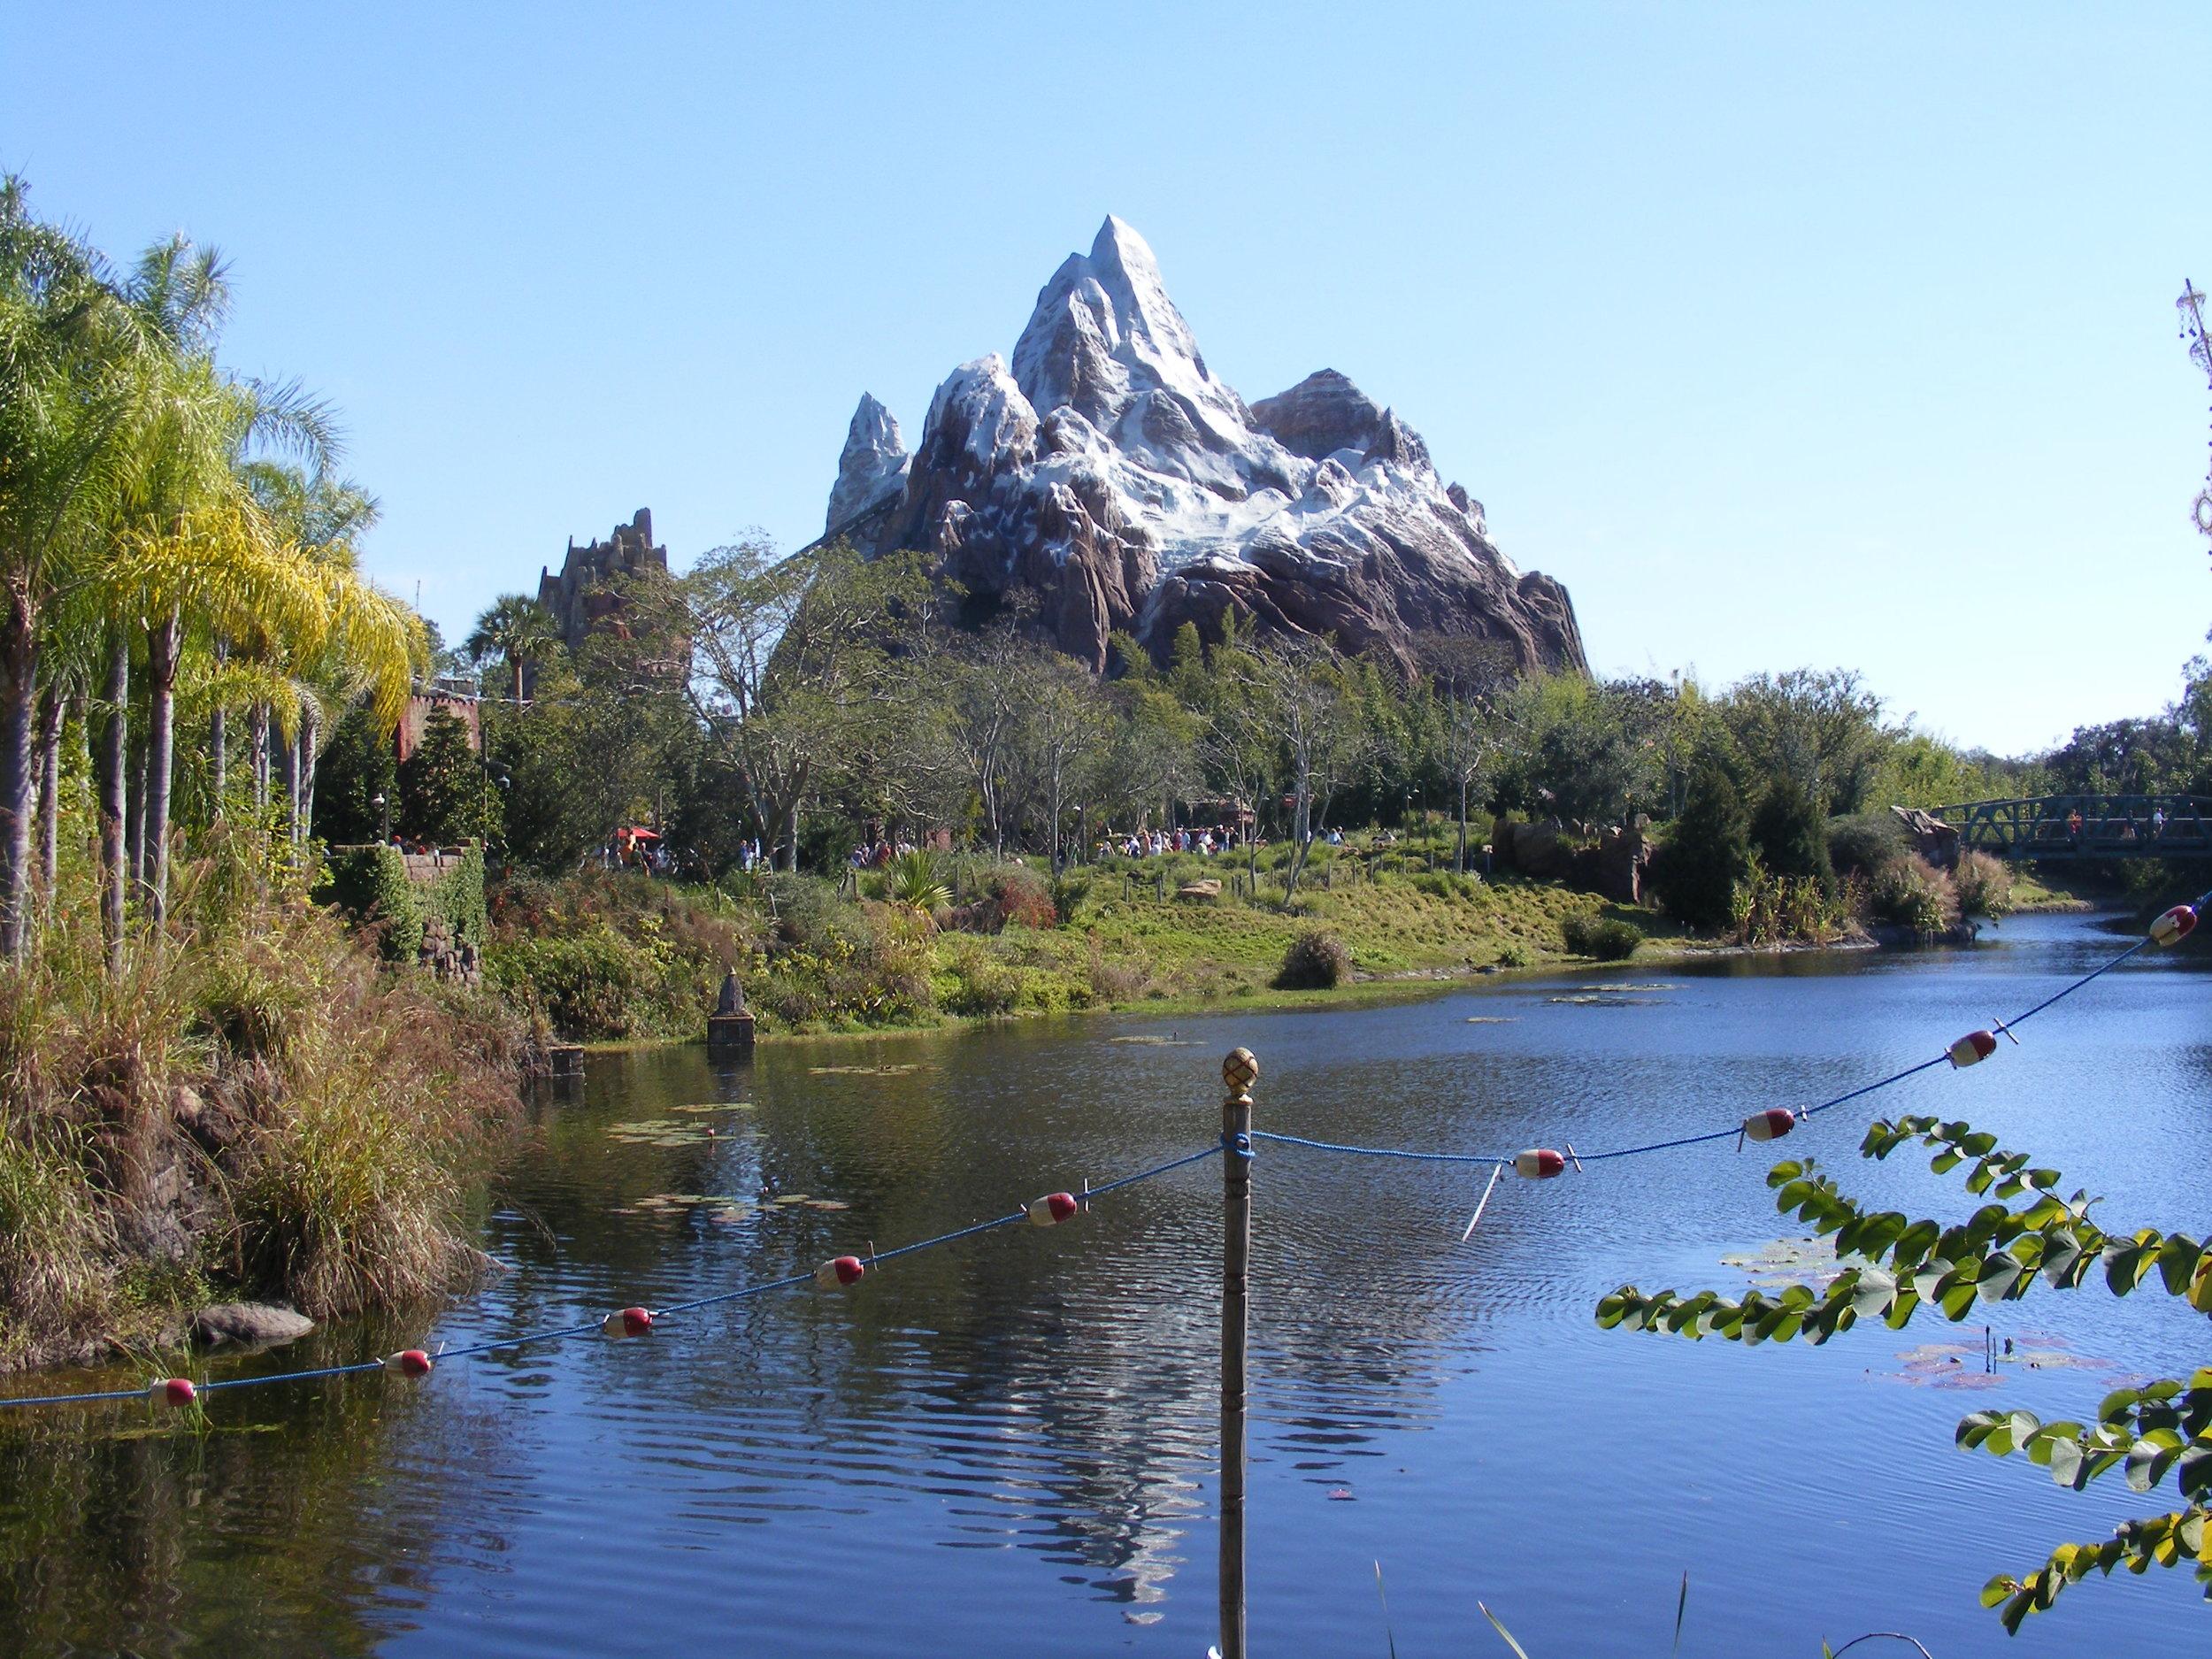 Expedition Everest, Asia, Disney's Animal Kingdom